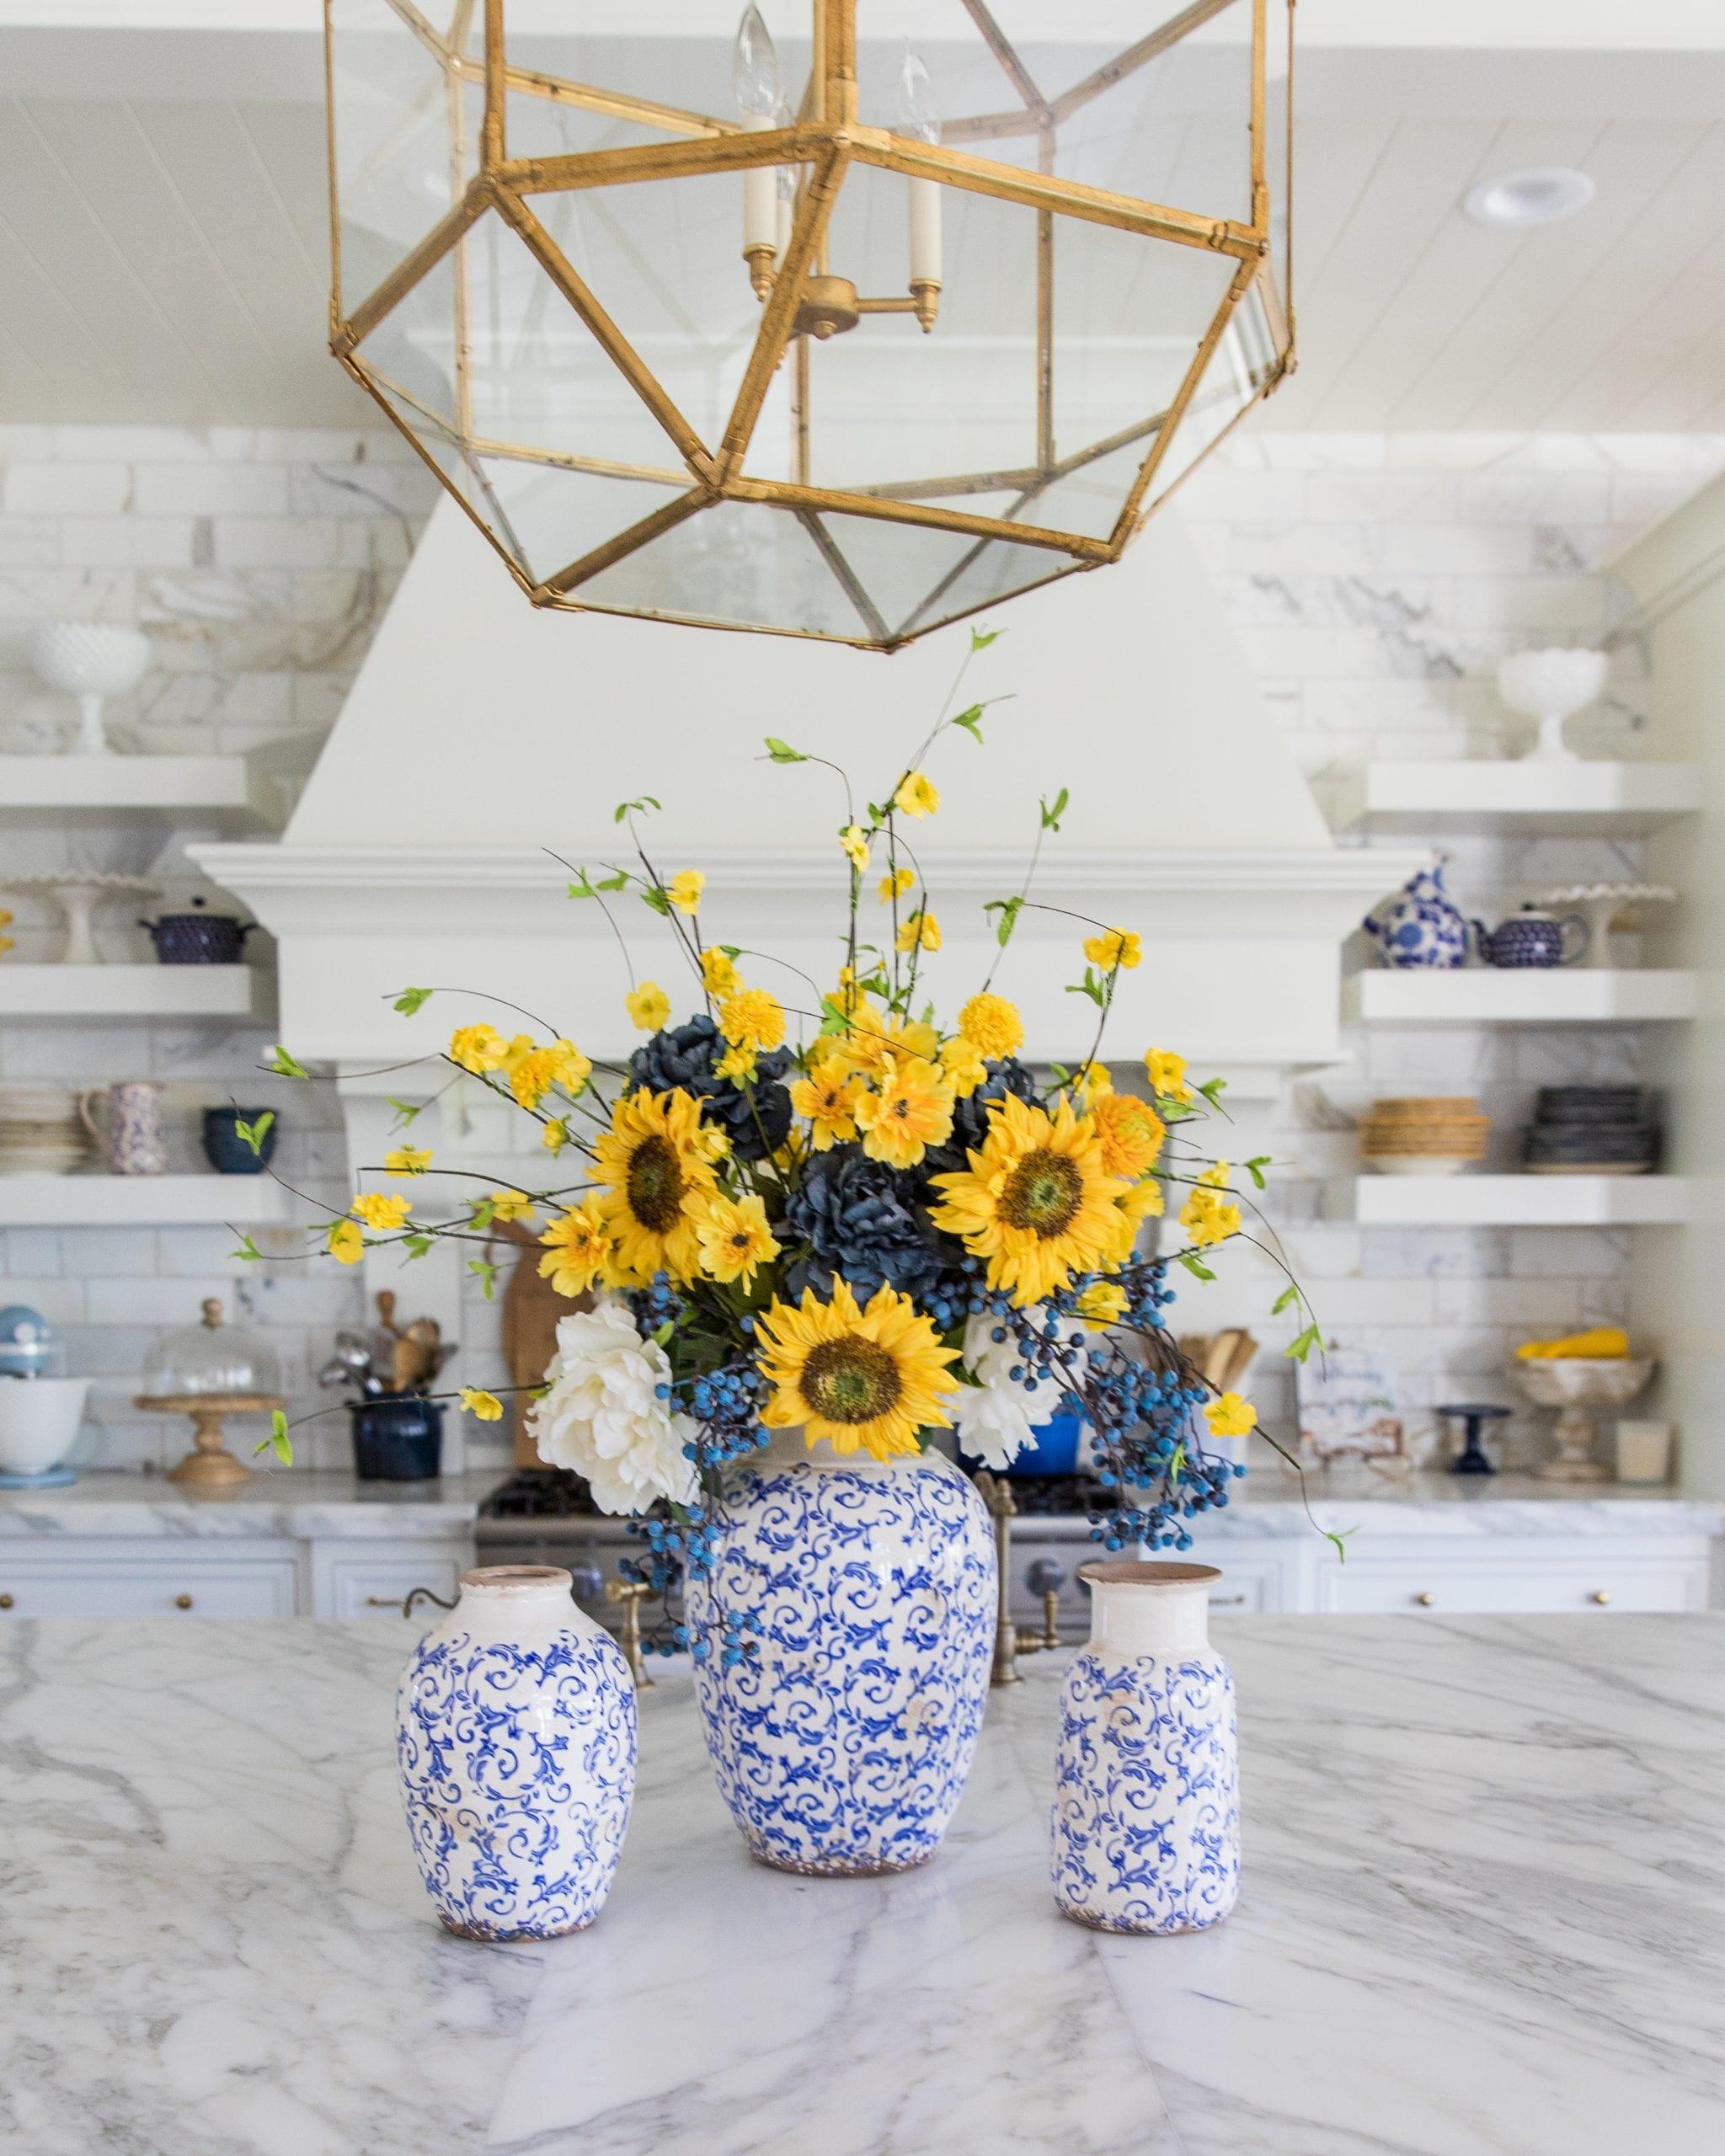 Diy Floral Arrangement Summer And Fall Floral Arrangements